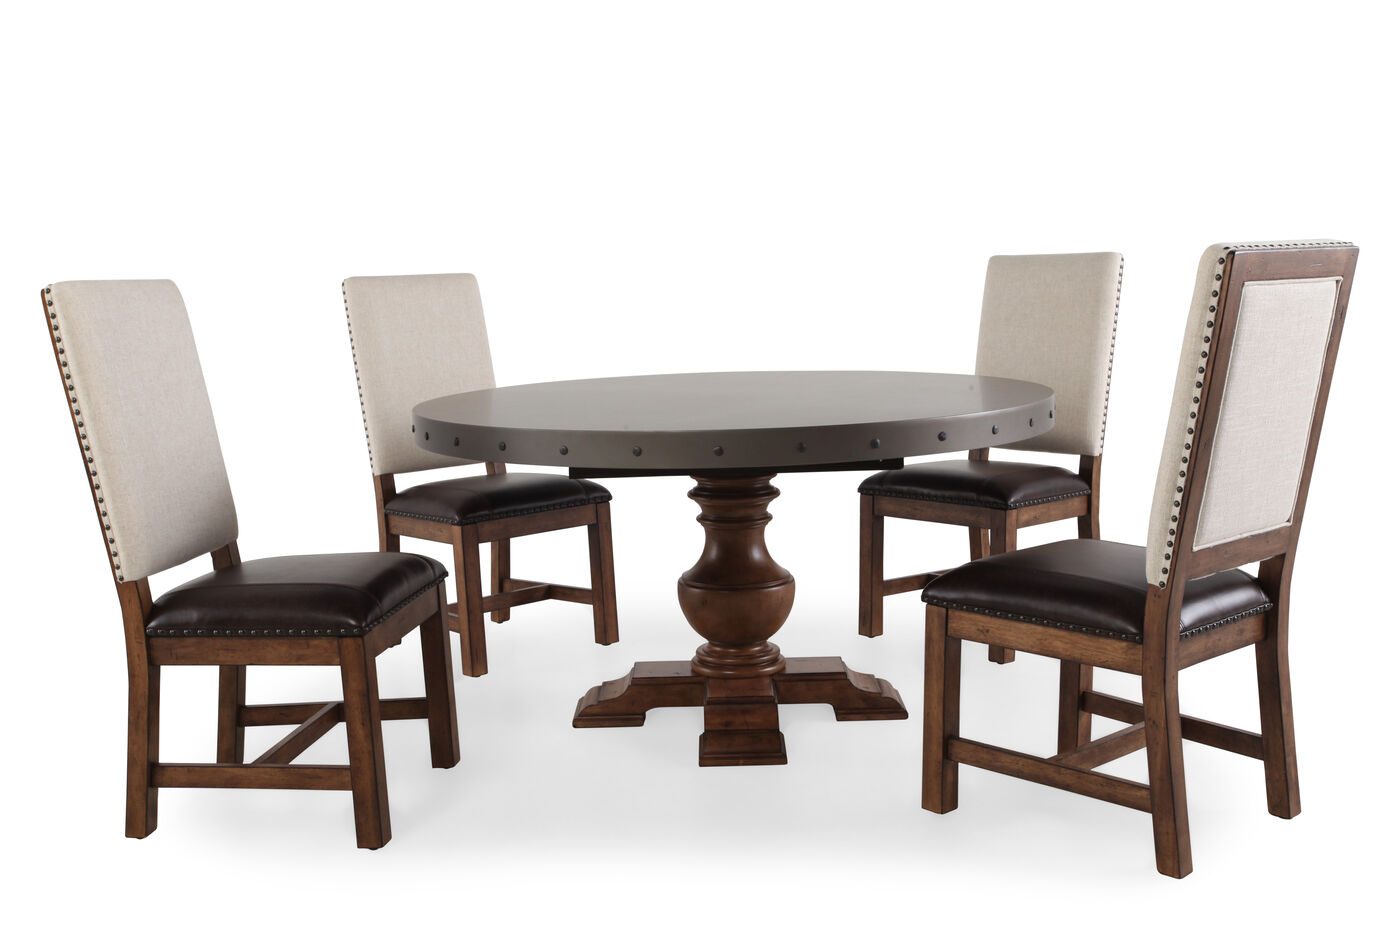 Pulaski Dining Table Pulaski Furnishing Dining Table  : PUL REDDINGTON5PC01 from www.amlibgroup.com size 1400 x 933 jpeg 100kB